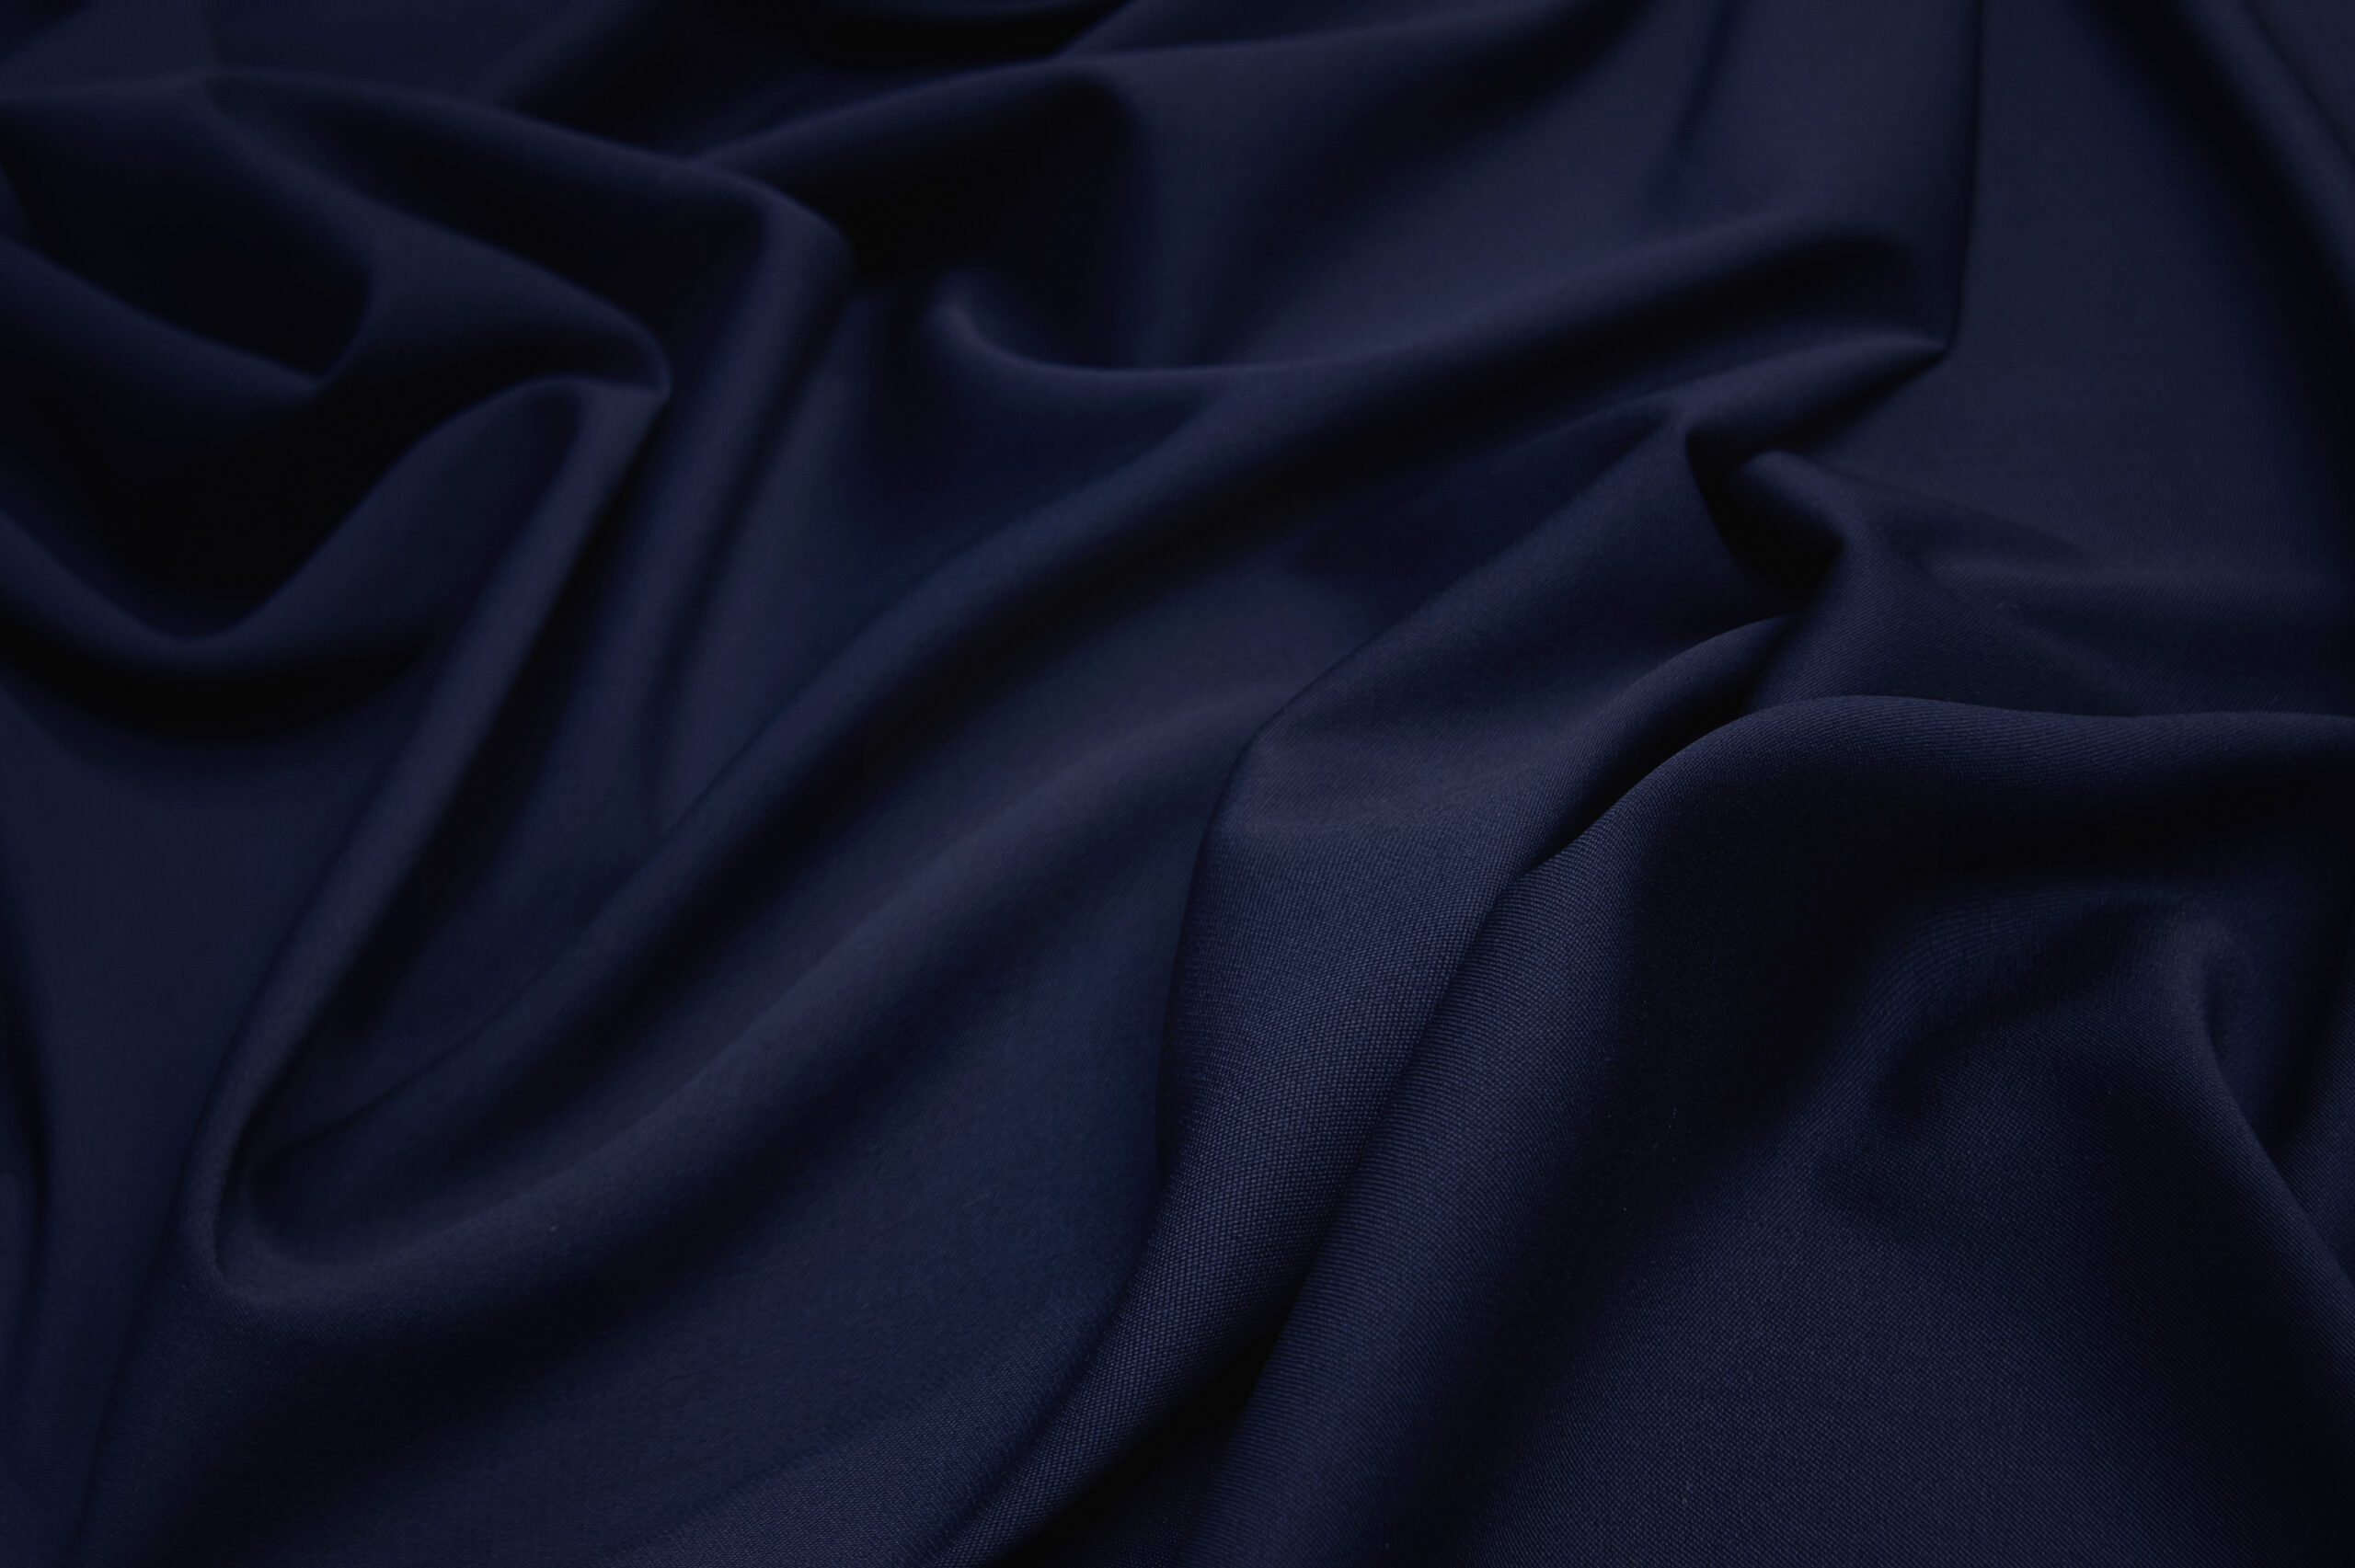 Luxurious woolen fabric in dark blue. Background and pattern.